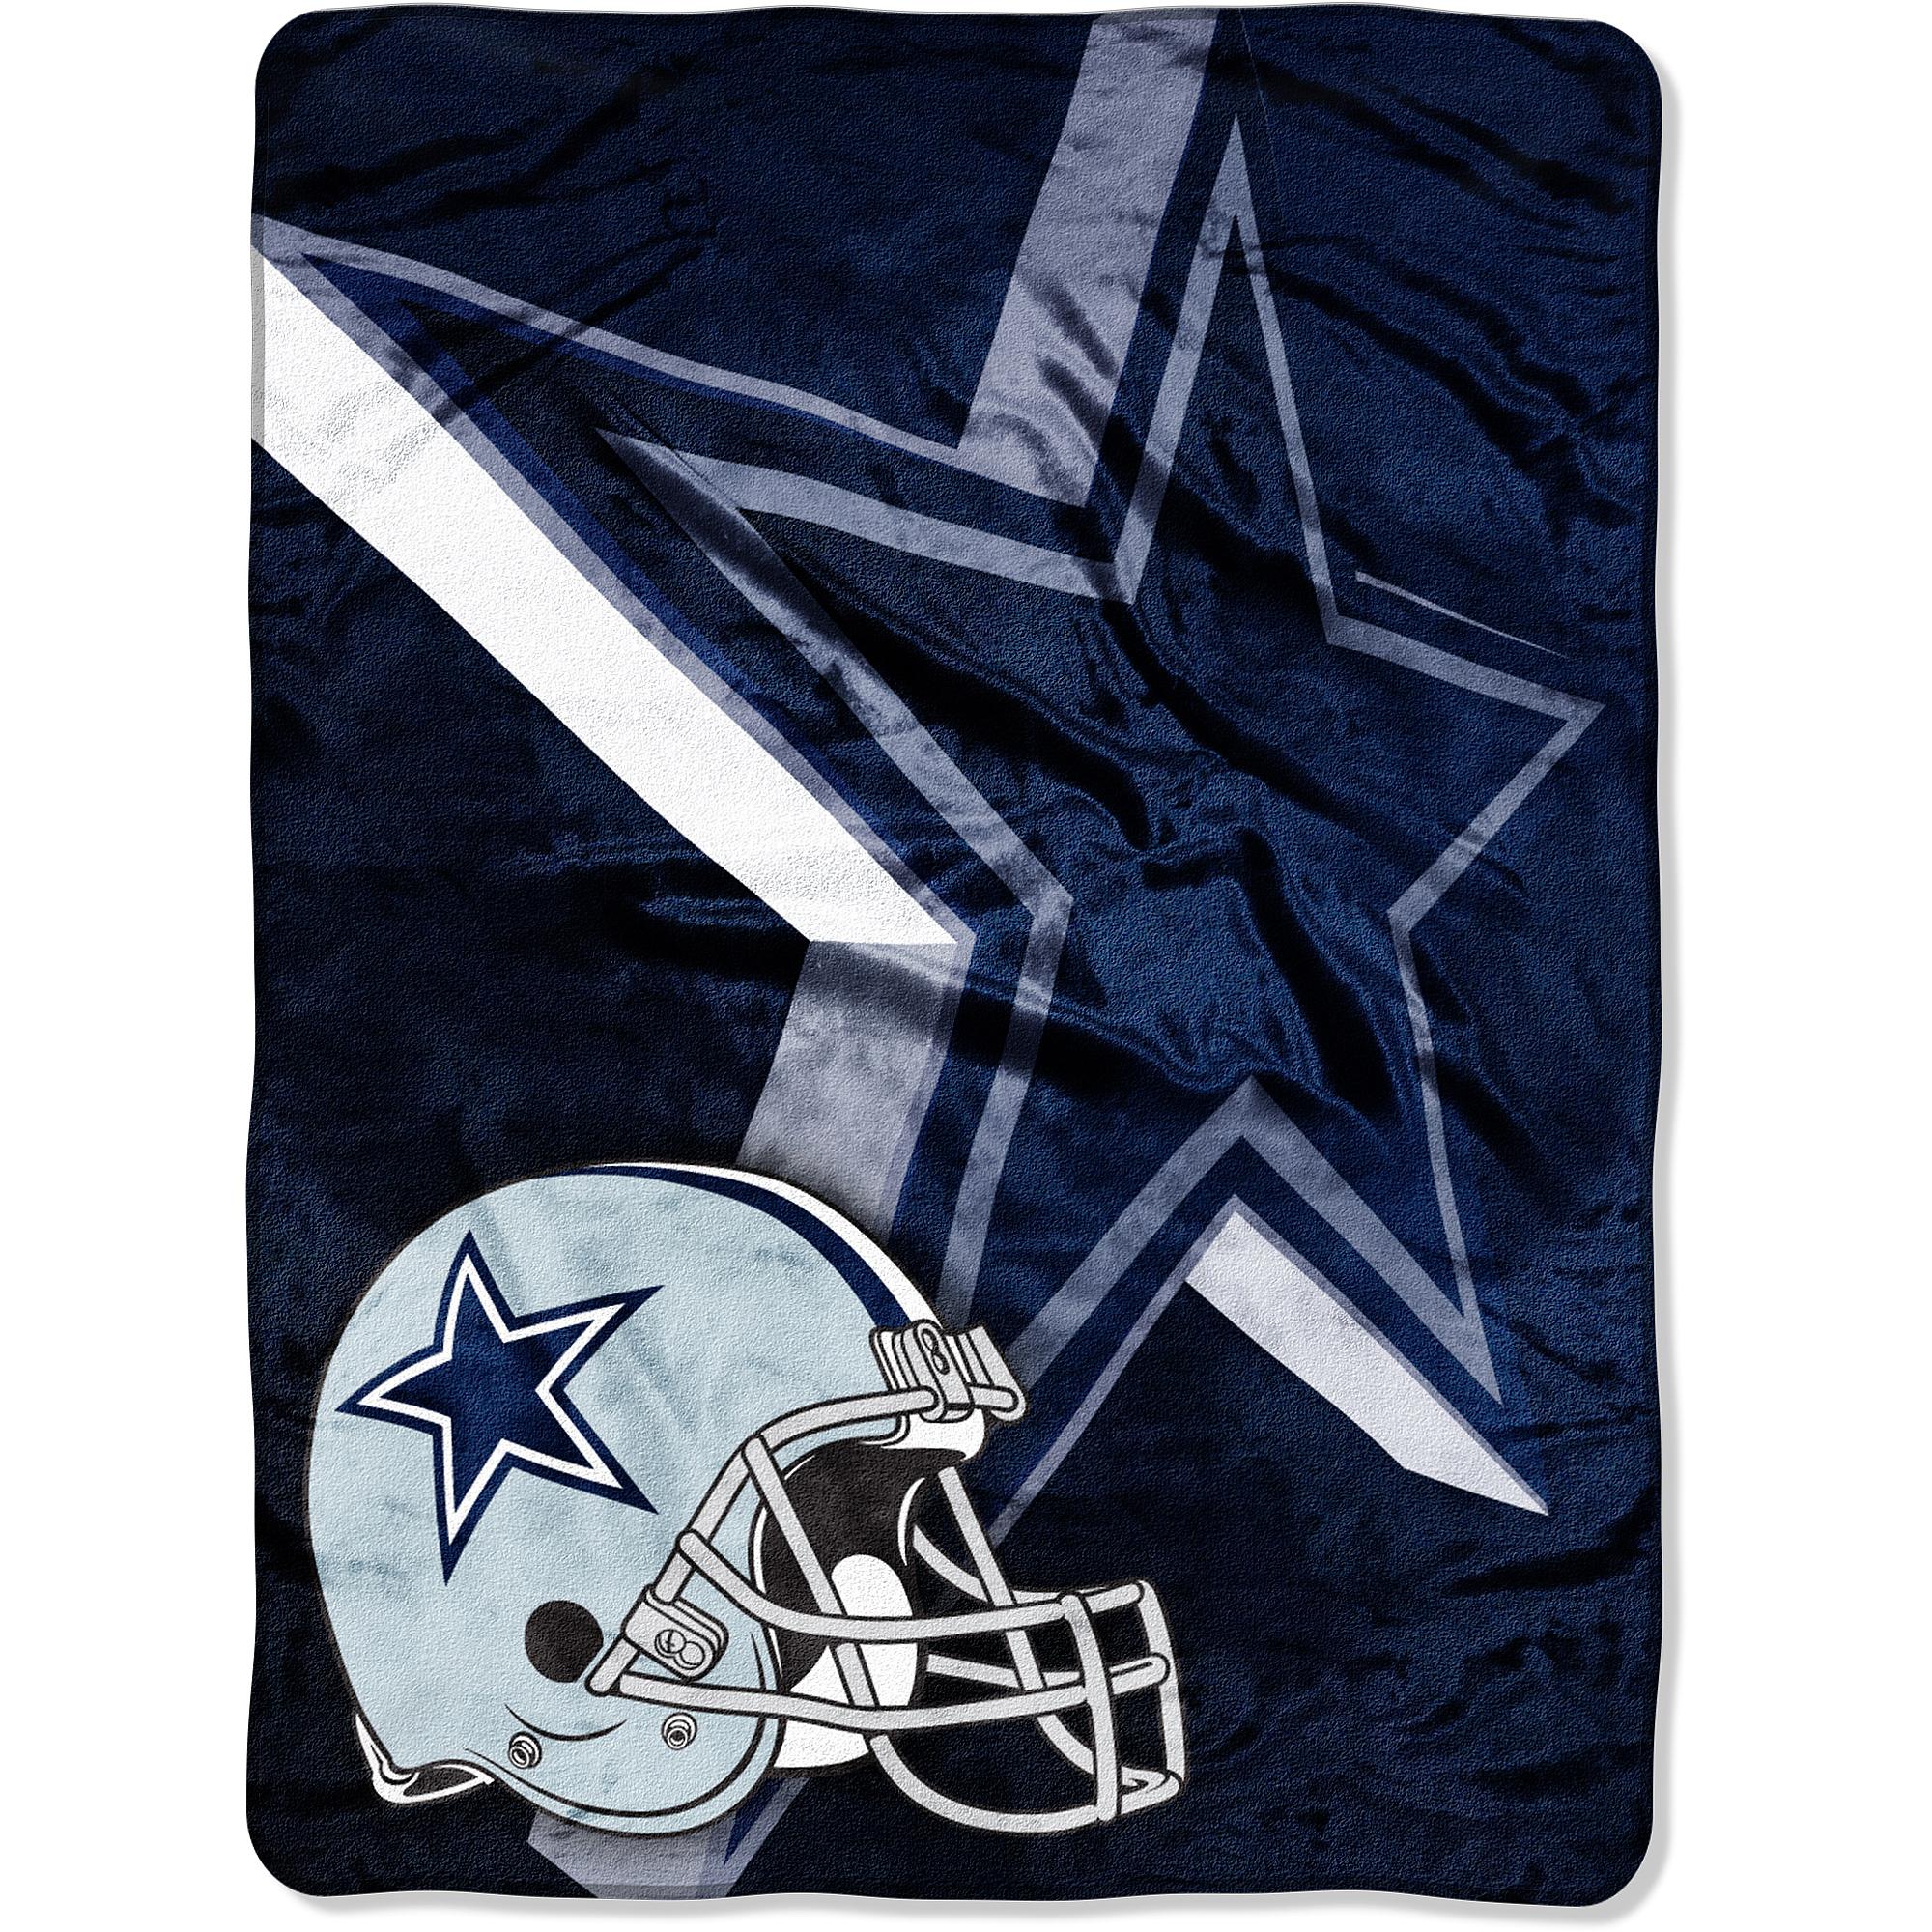 NFL Cowboys 60x80 Micro Raschel Blanket